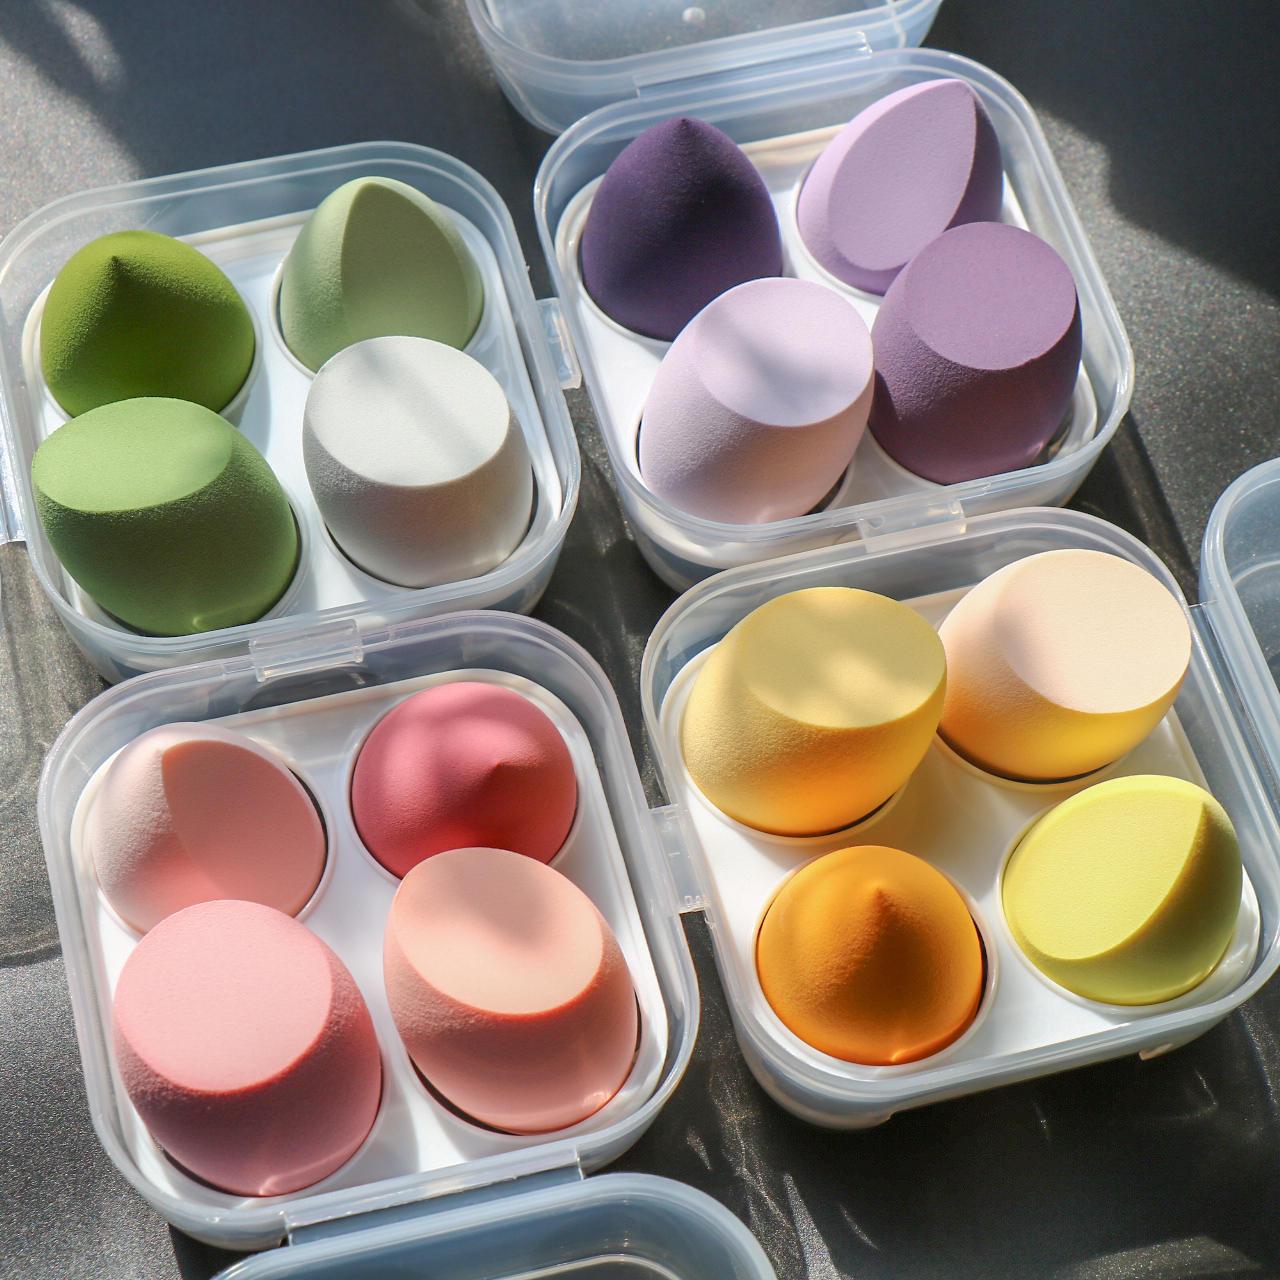 Makeup Blender Cosmetic Puff Makeup Sponge with Storage Box Foundation Powder Sponge Beauty Tool Wom